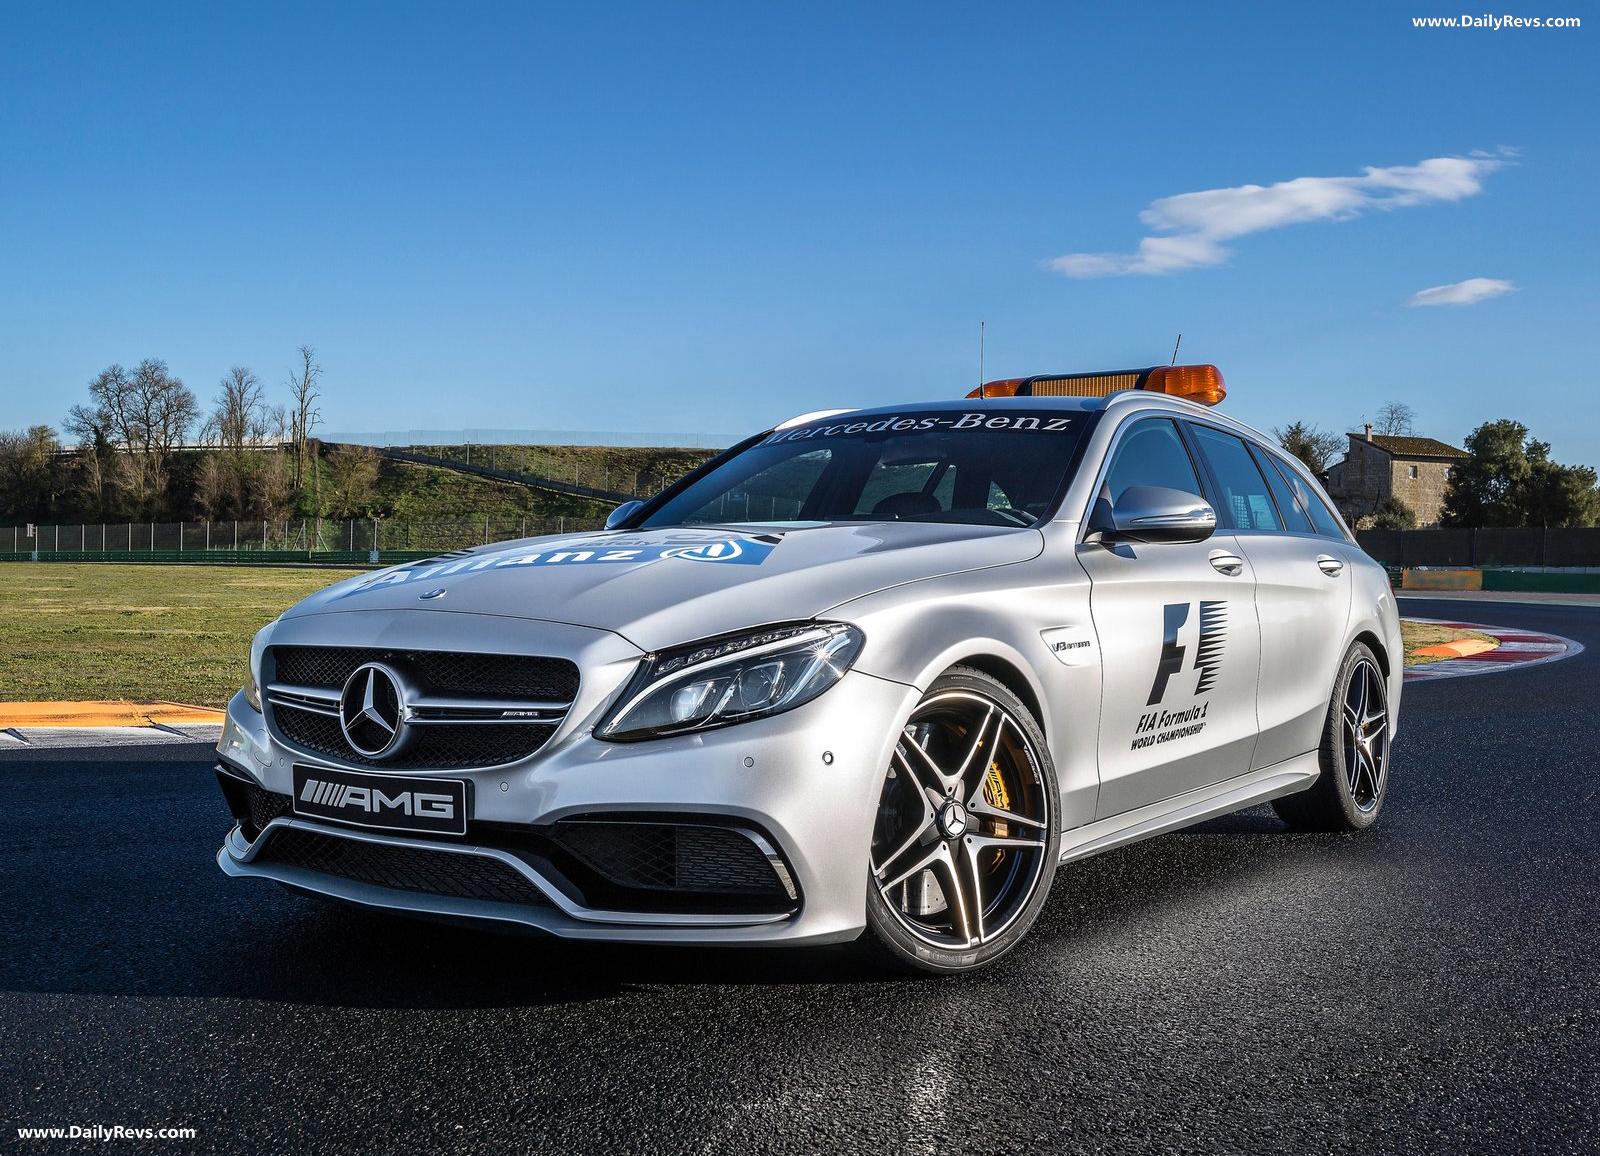 2015 Mercedes-Benz C63 S AMG Estate F1 Medical Car - Dailyrevs